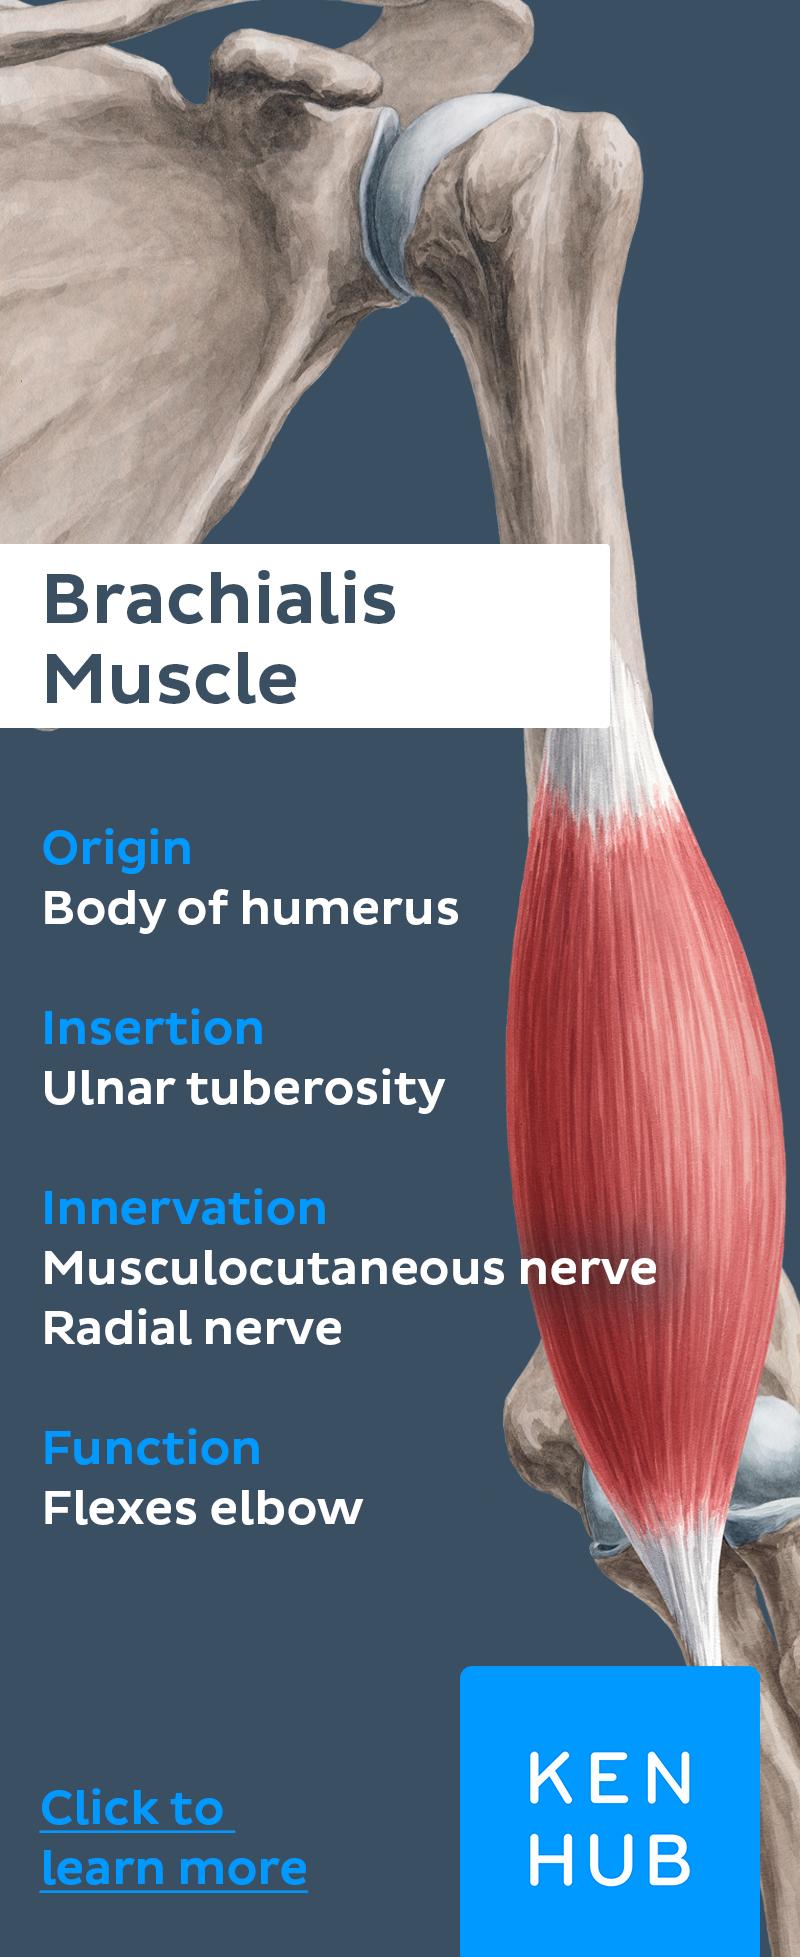 Brachialis Muscle Medicos Anatomy Muscle Muscle Anatomy